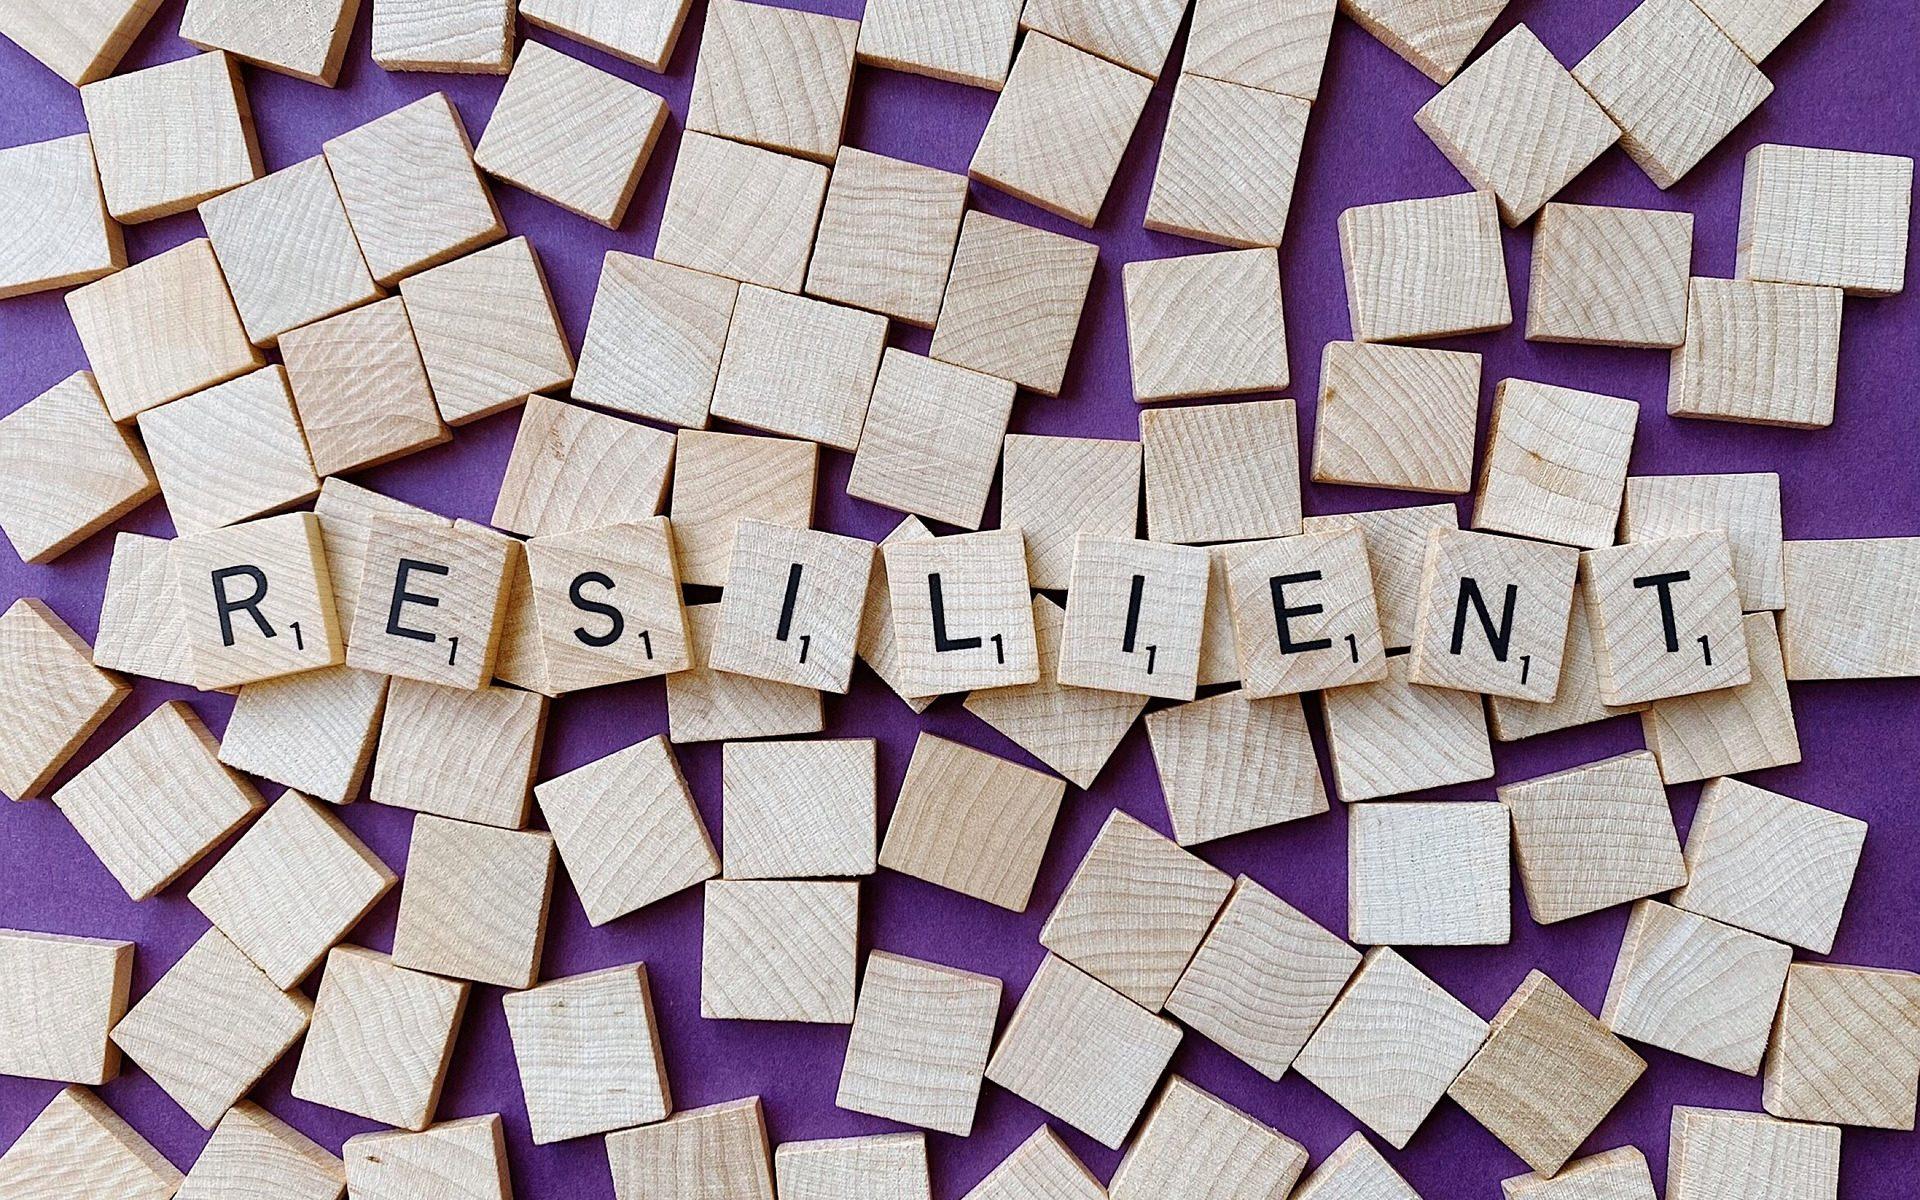 LabCom Resilienza